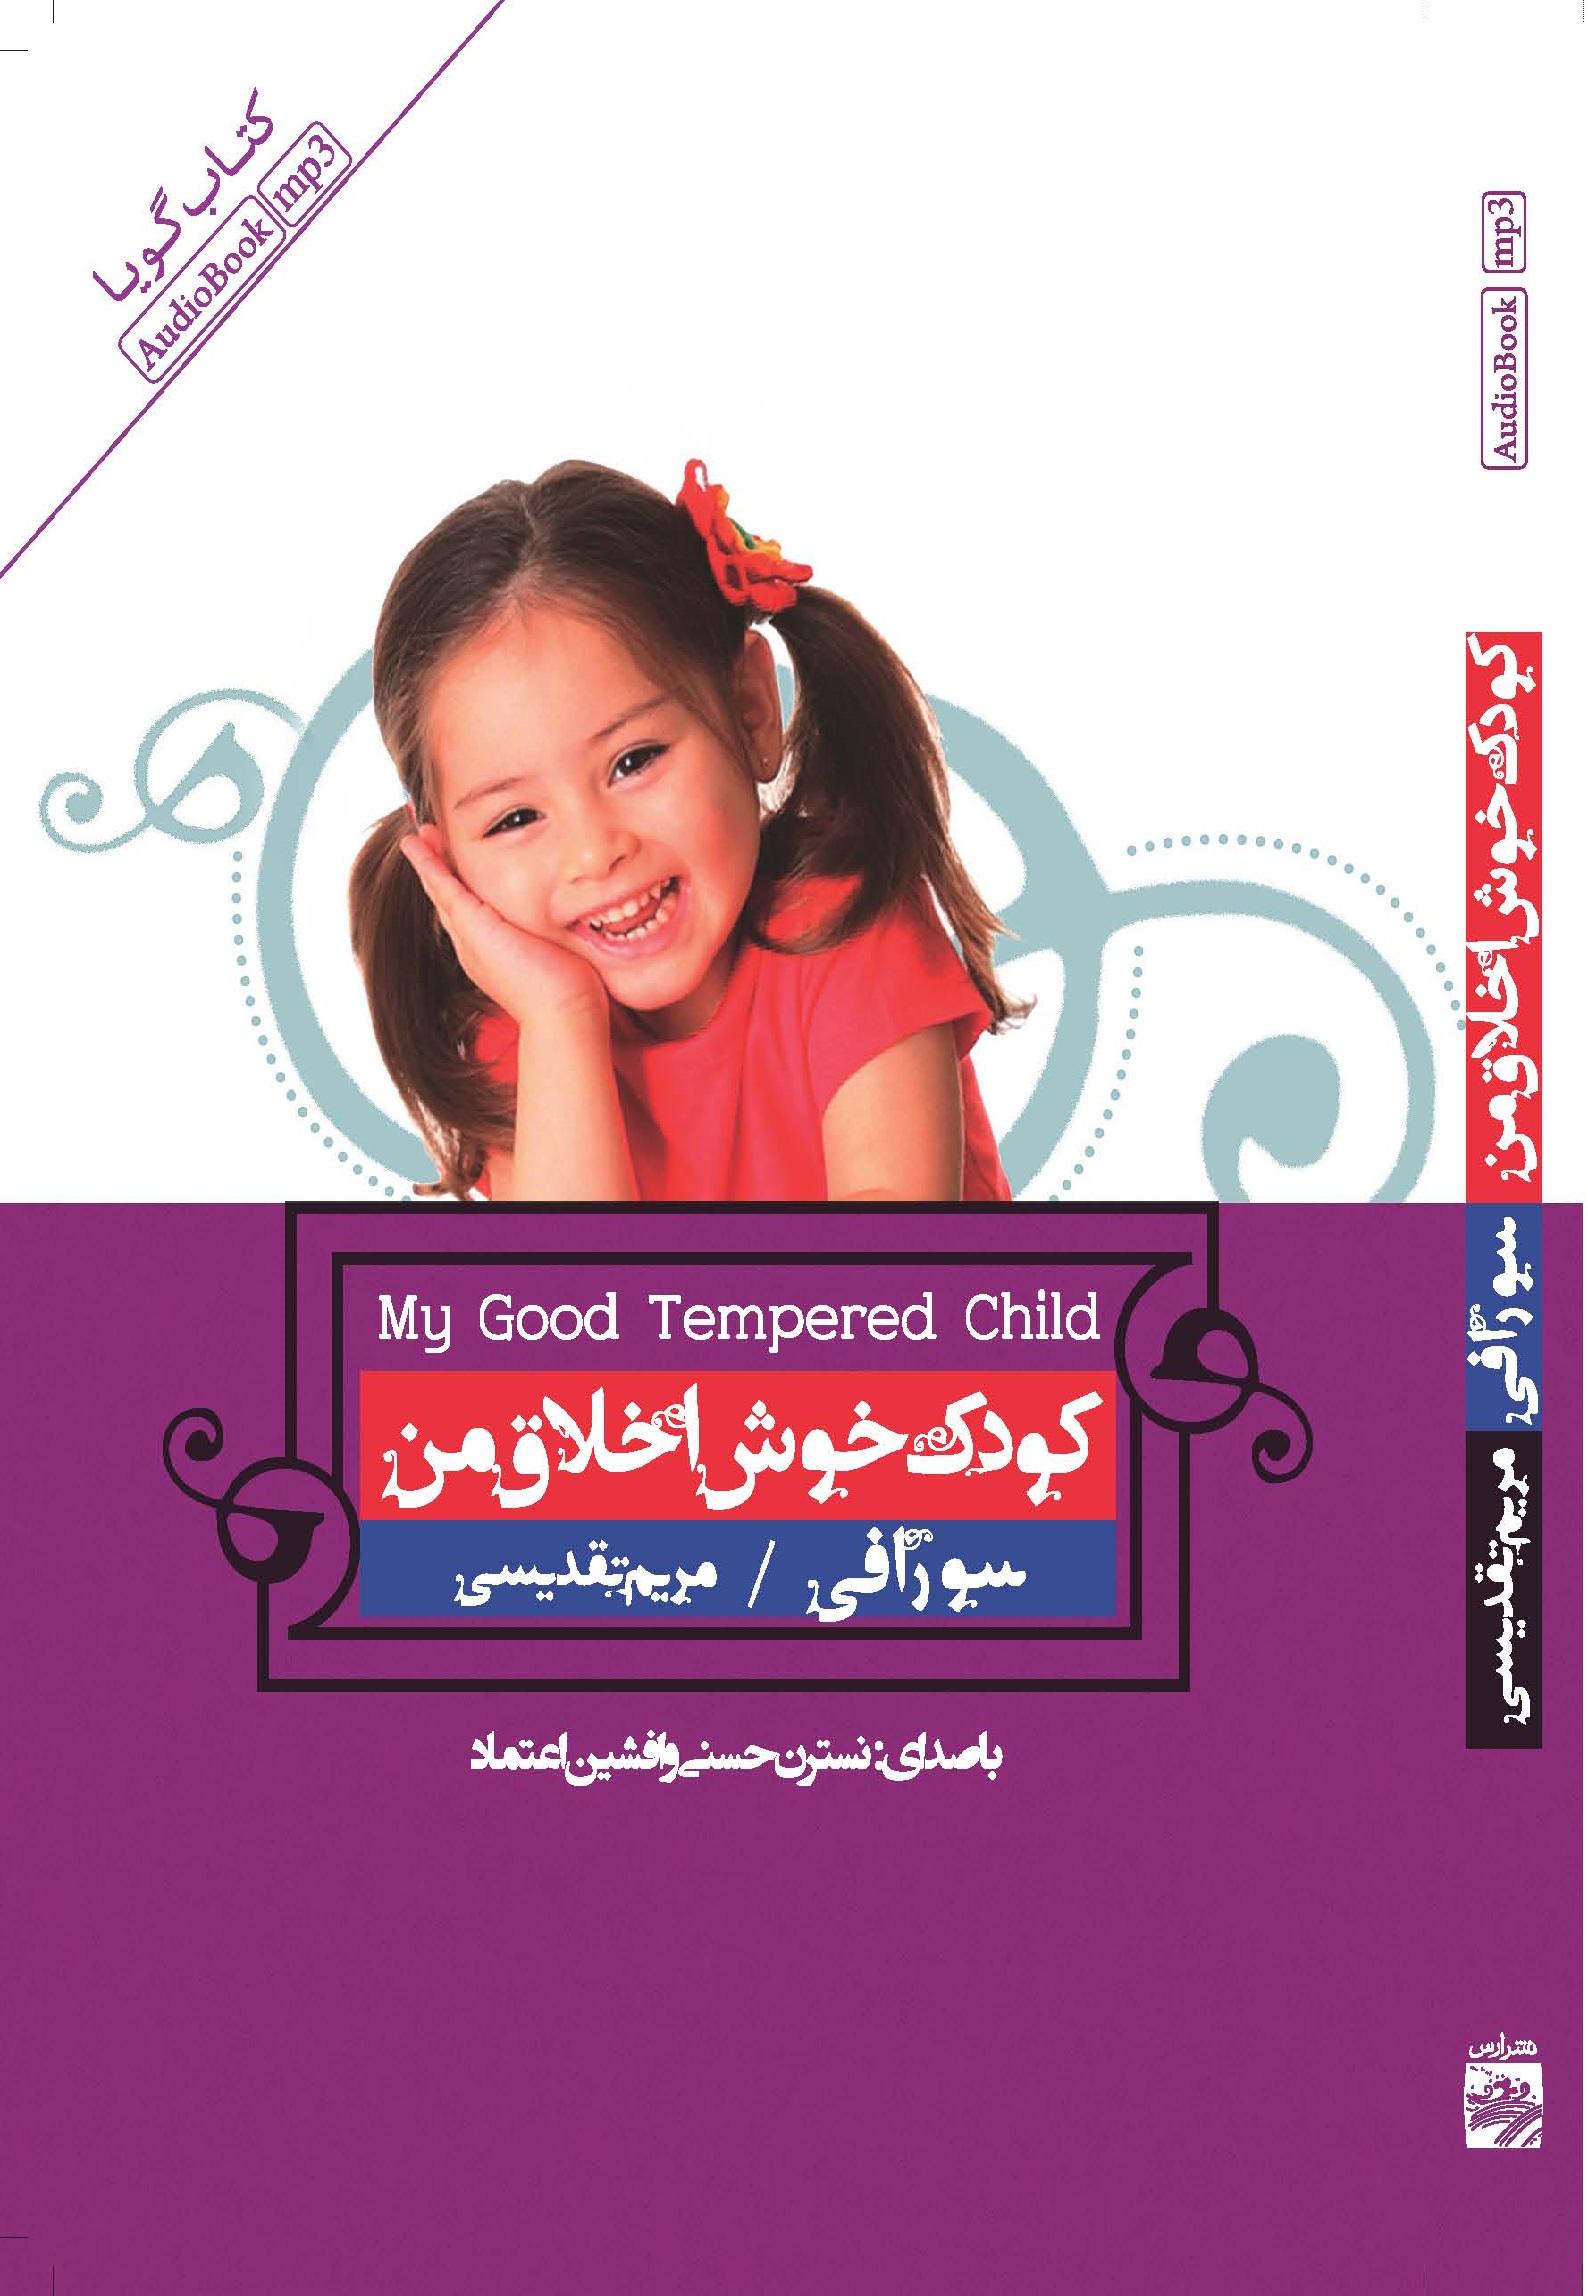 کتاب صوتی کودک خوشاخلاق من